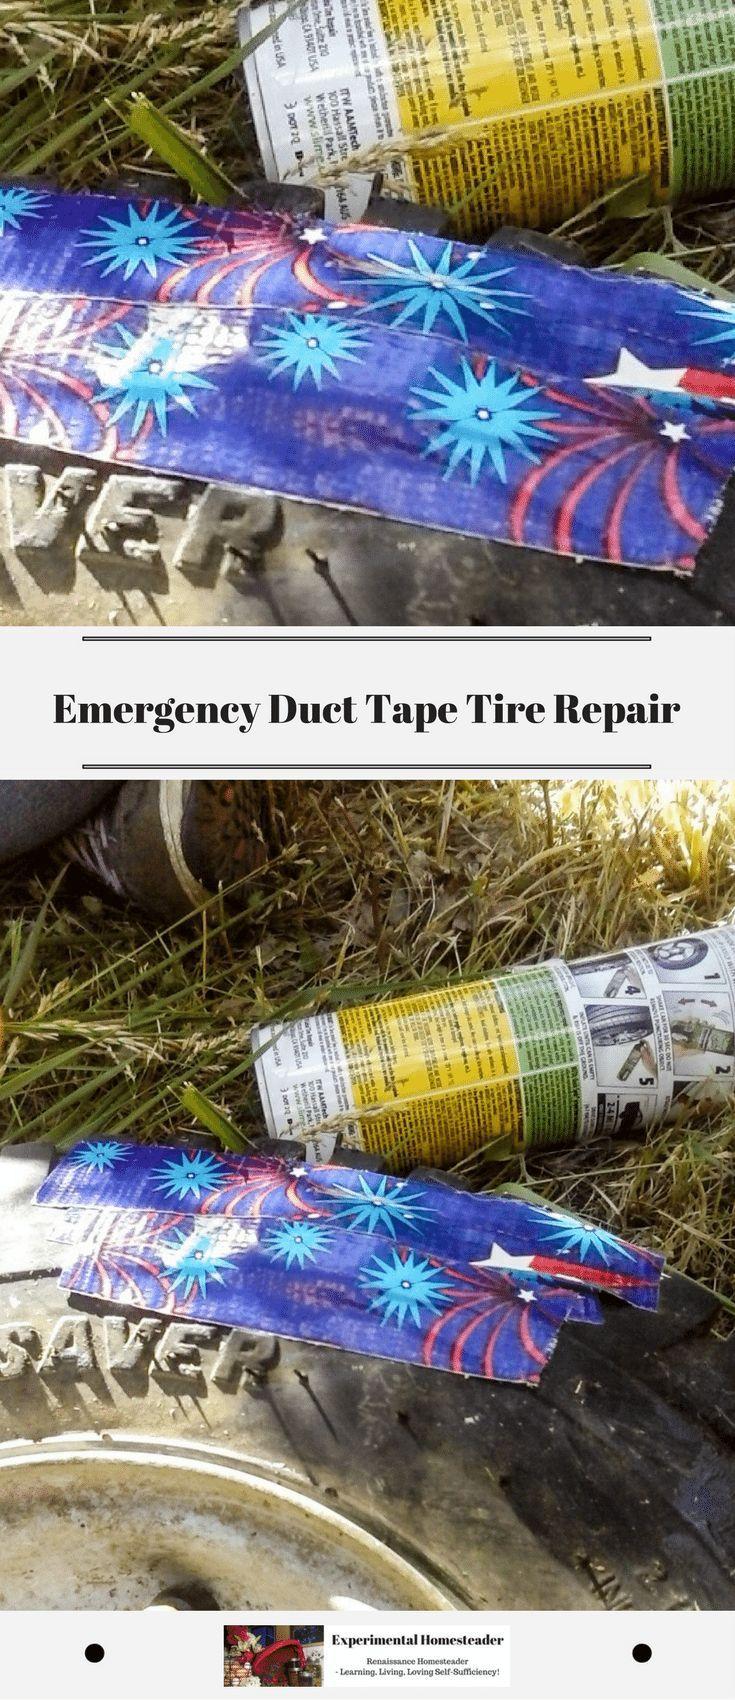 Emergency duct tape tire repair experimental homesteader